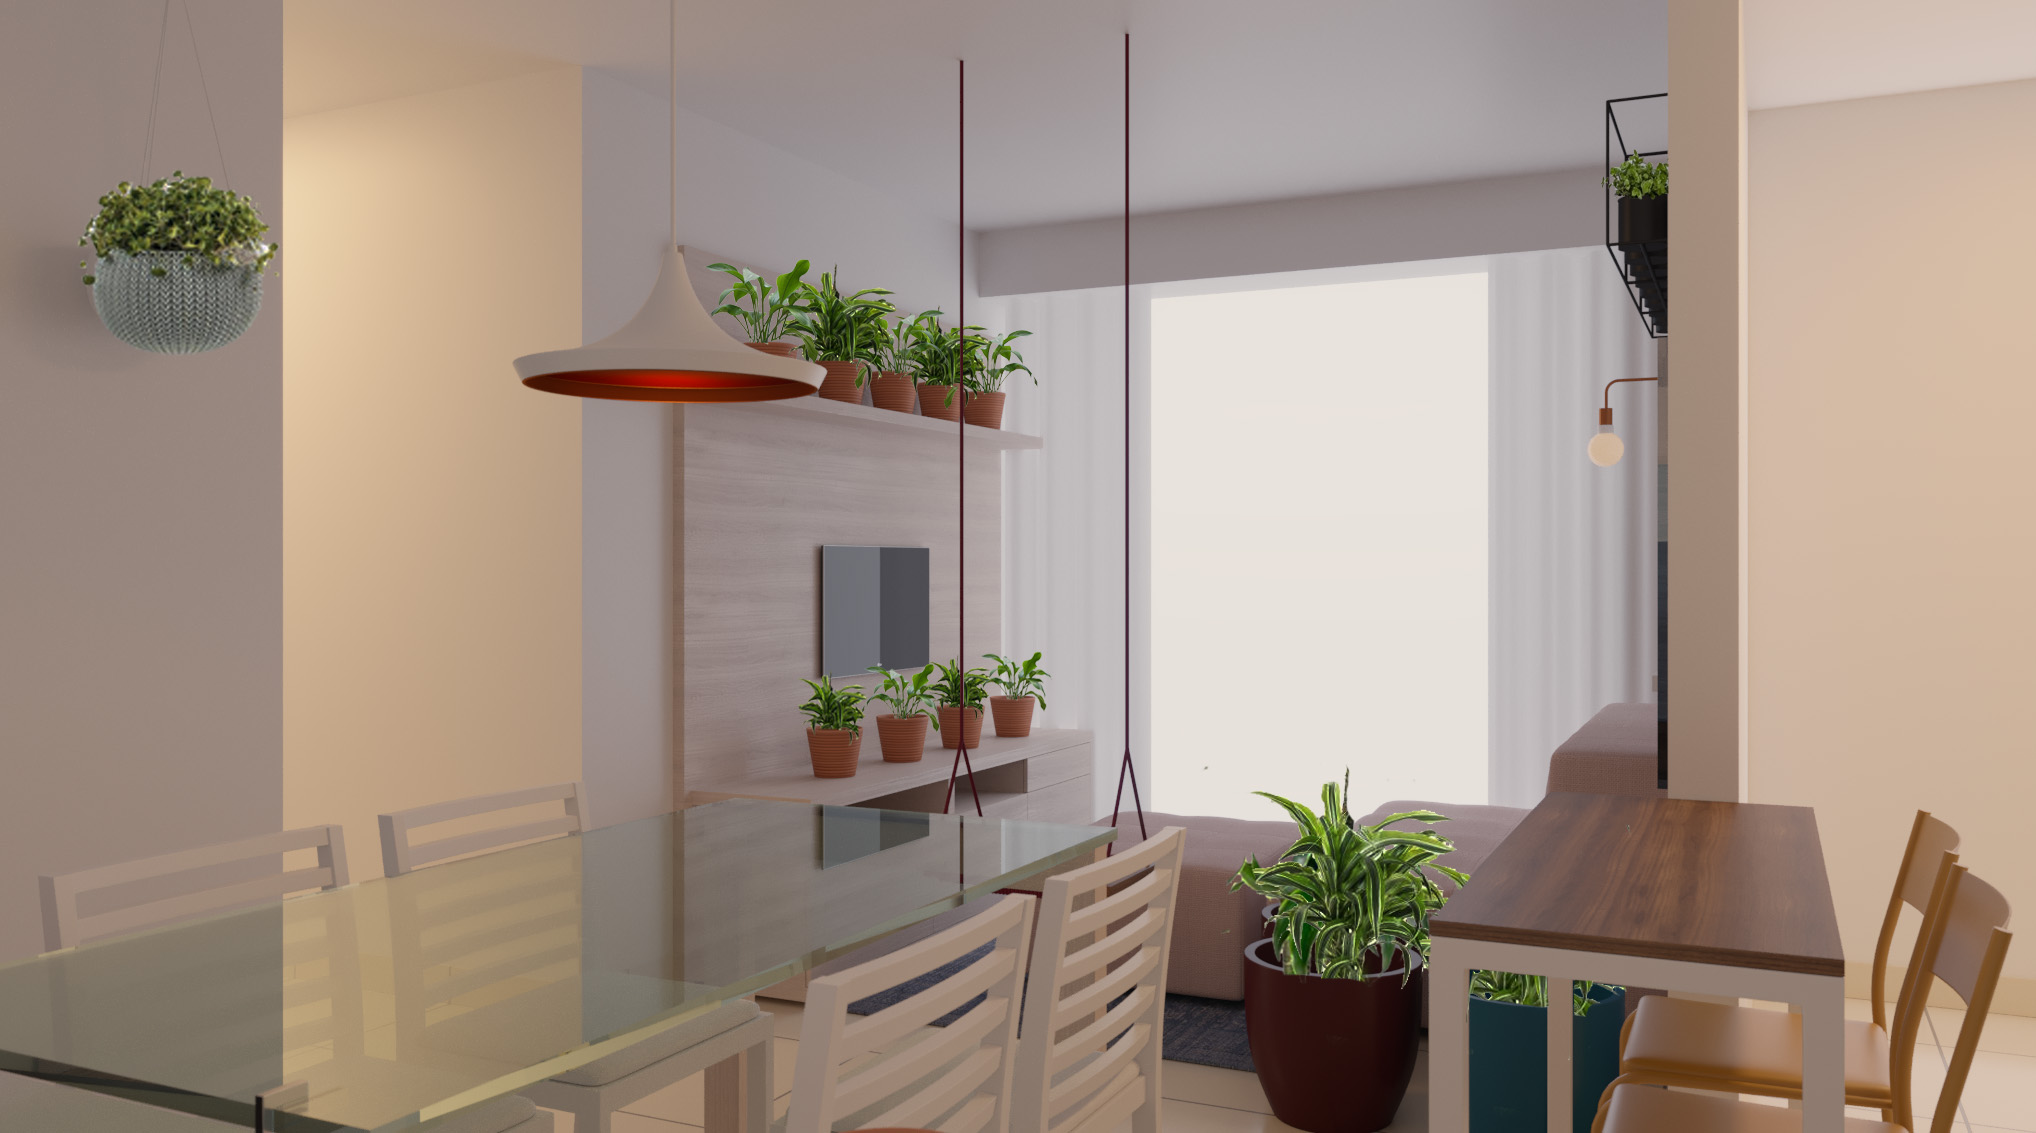 Sala Integrada estilo Divertido Rústico